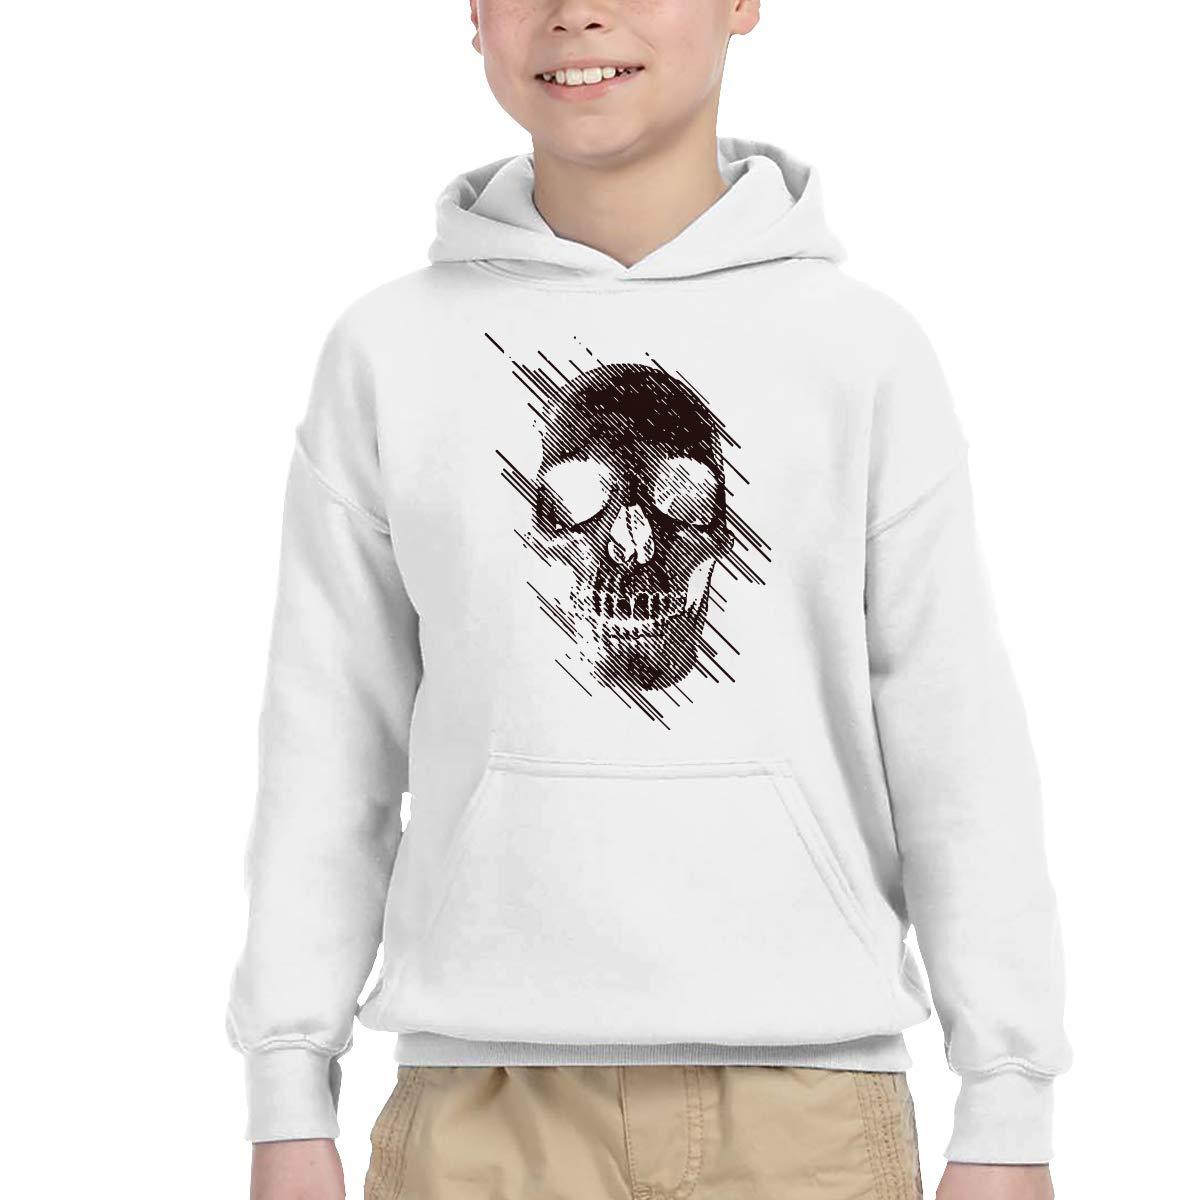 WER7 Toddler Baby Boys Girls Pocket Hooded Coat,Kids Jackets Long Sleeve Tops